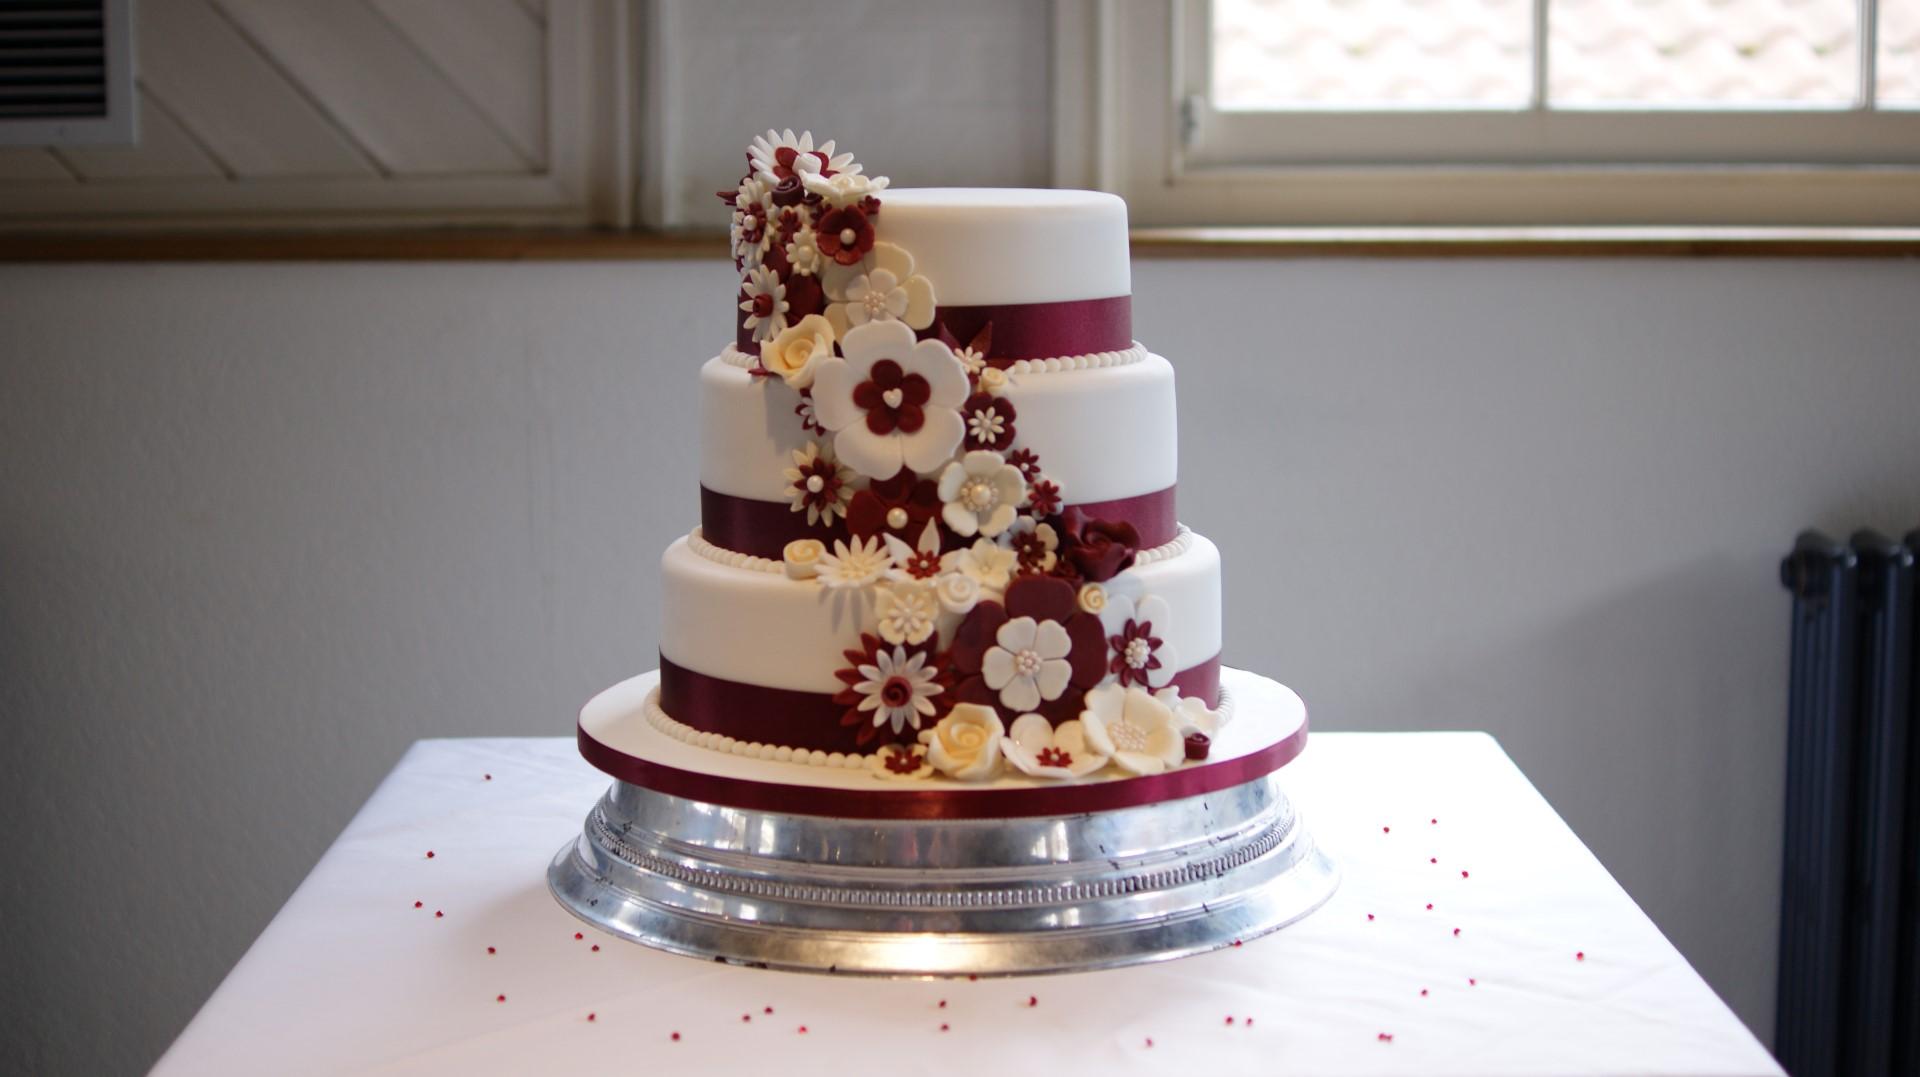 Disney 3 Tier Wedding Cake Draped Floral Design 2 Bakealous